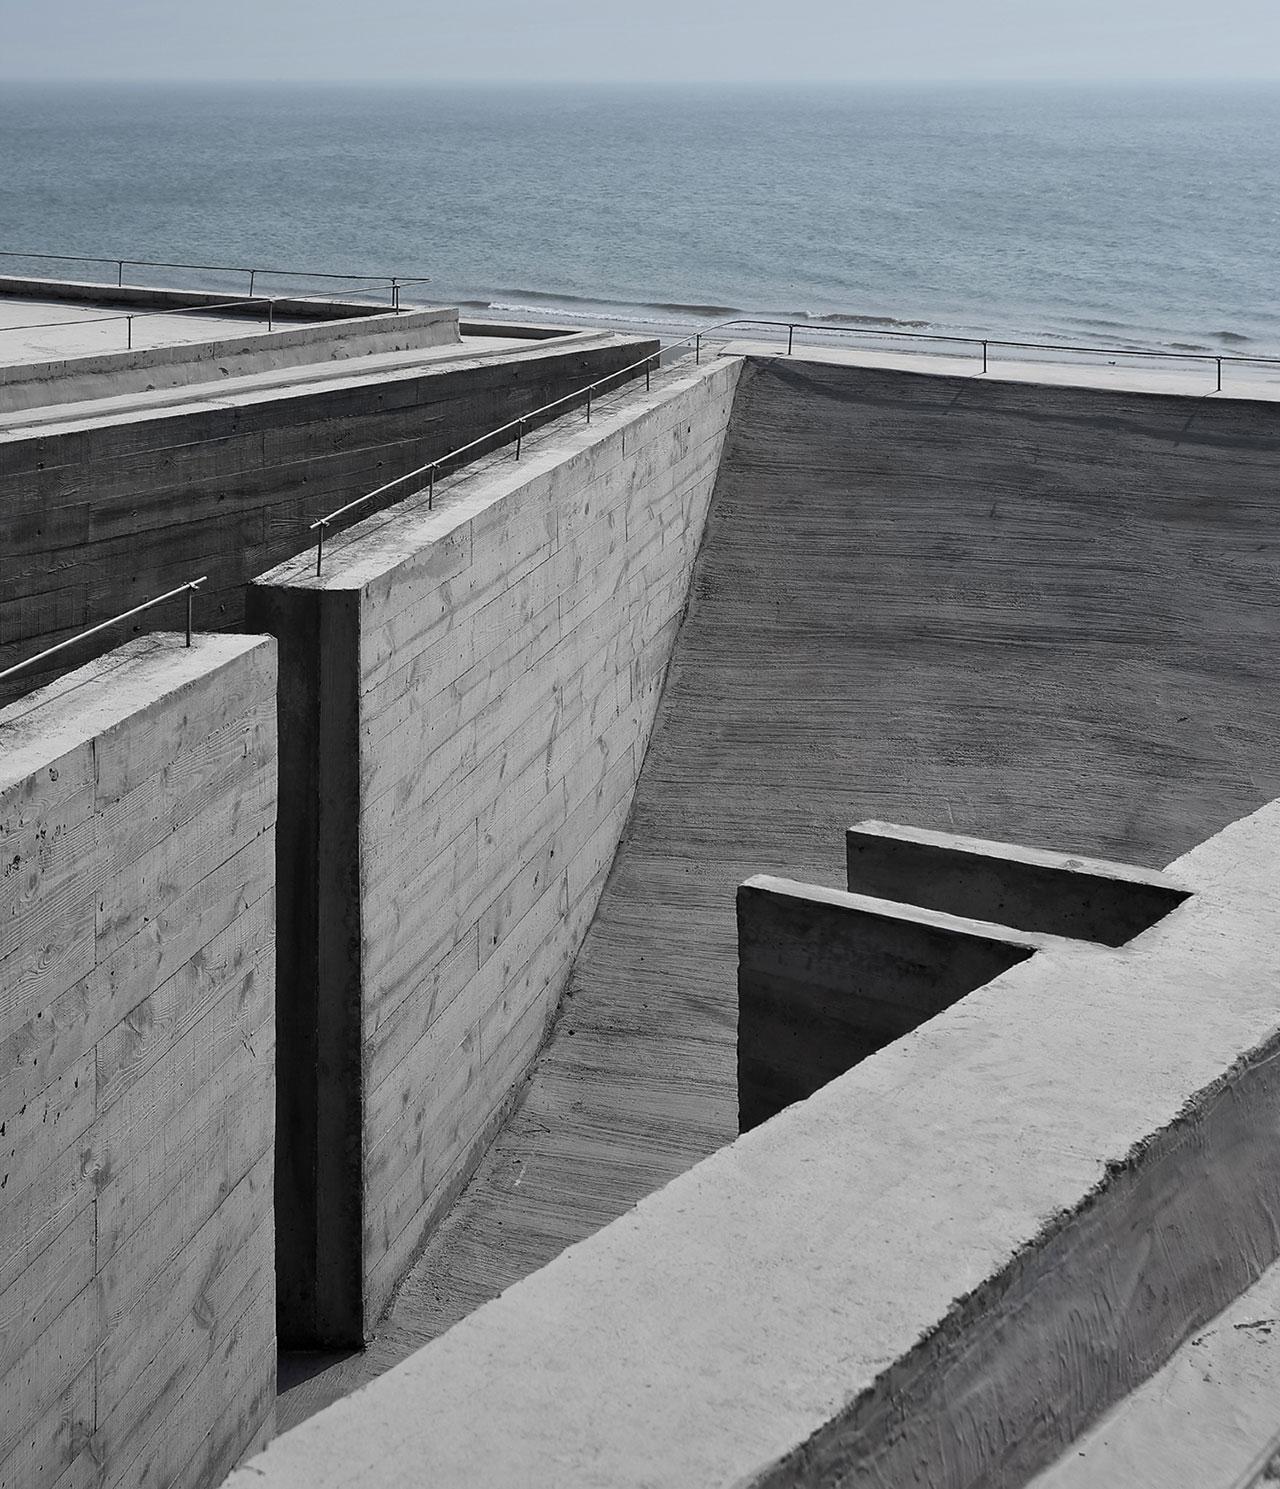 f11_seashore_library_qinhuangdao_vector_architects_yatzer.jpg